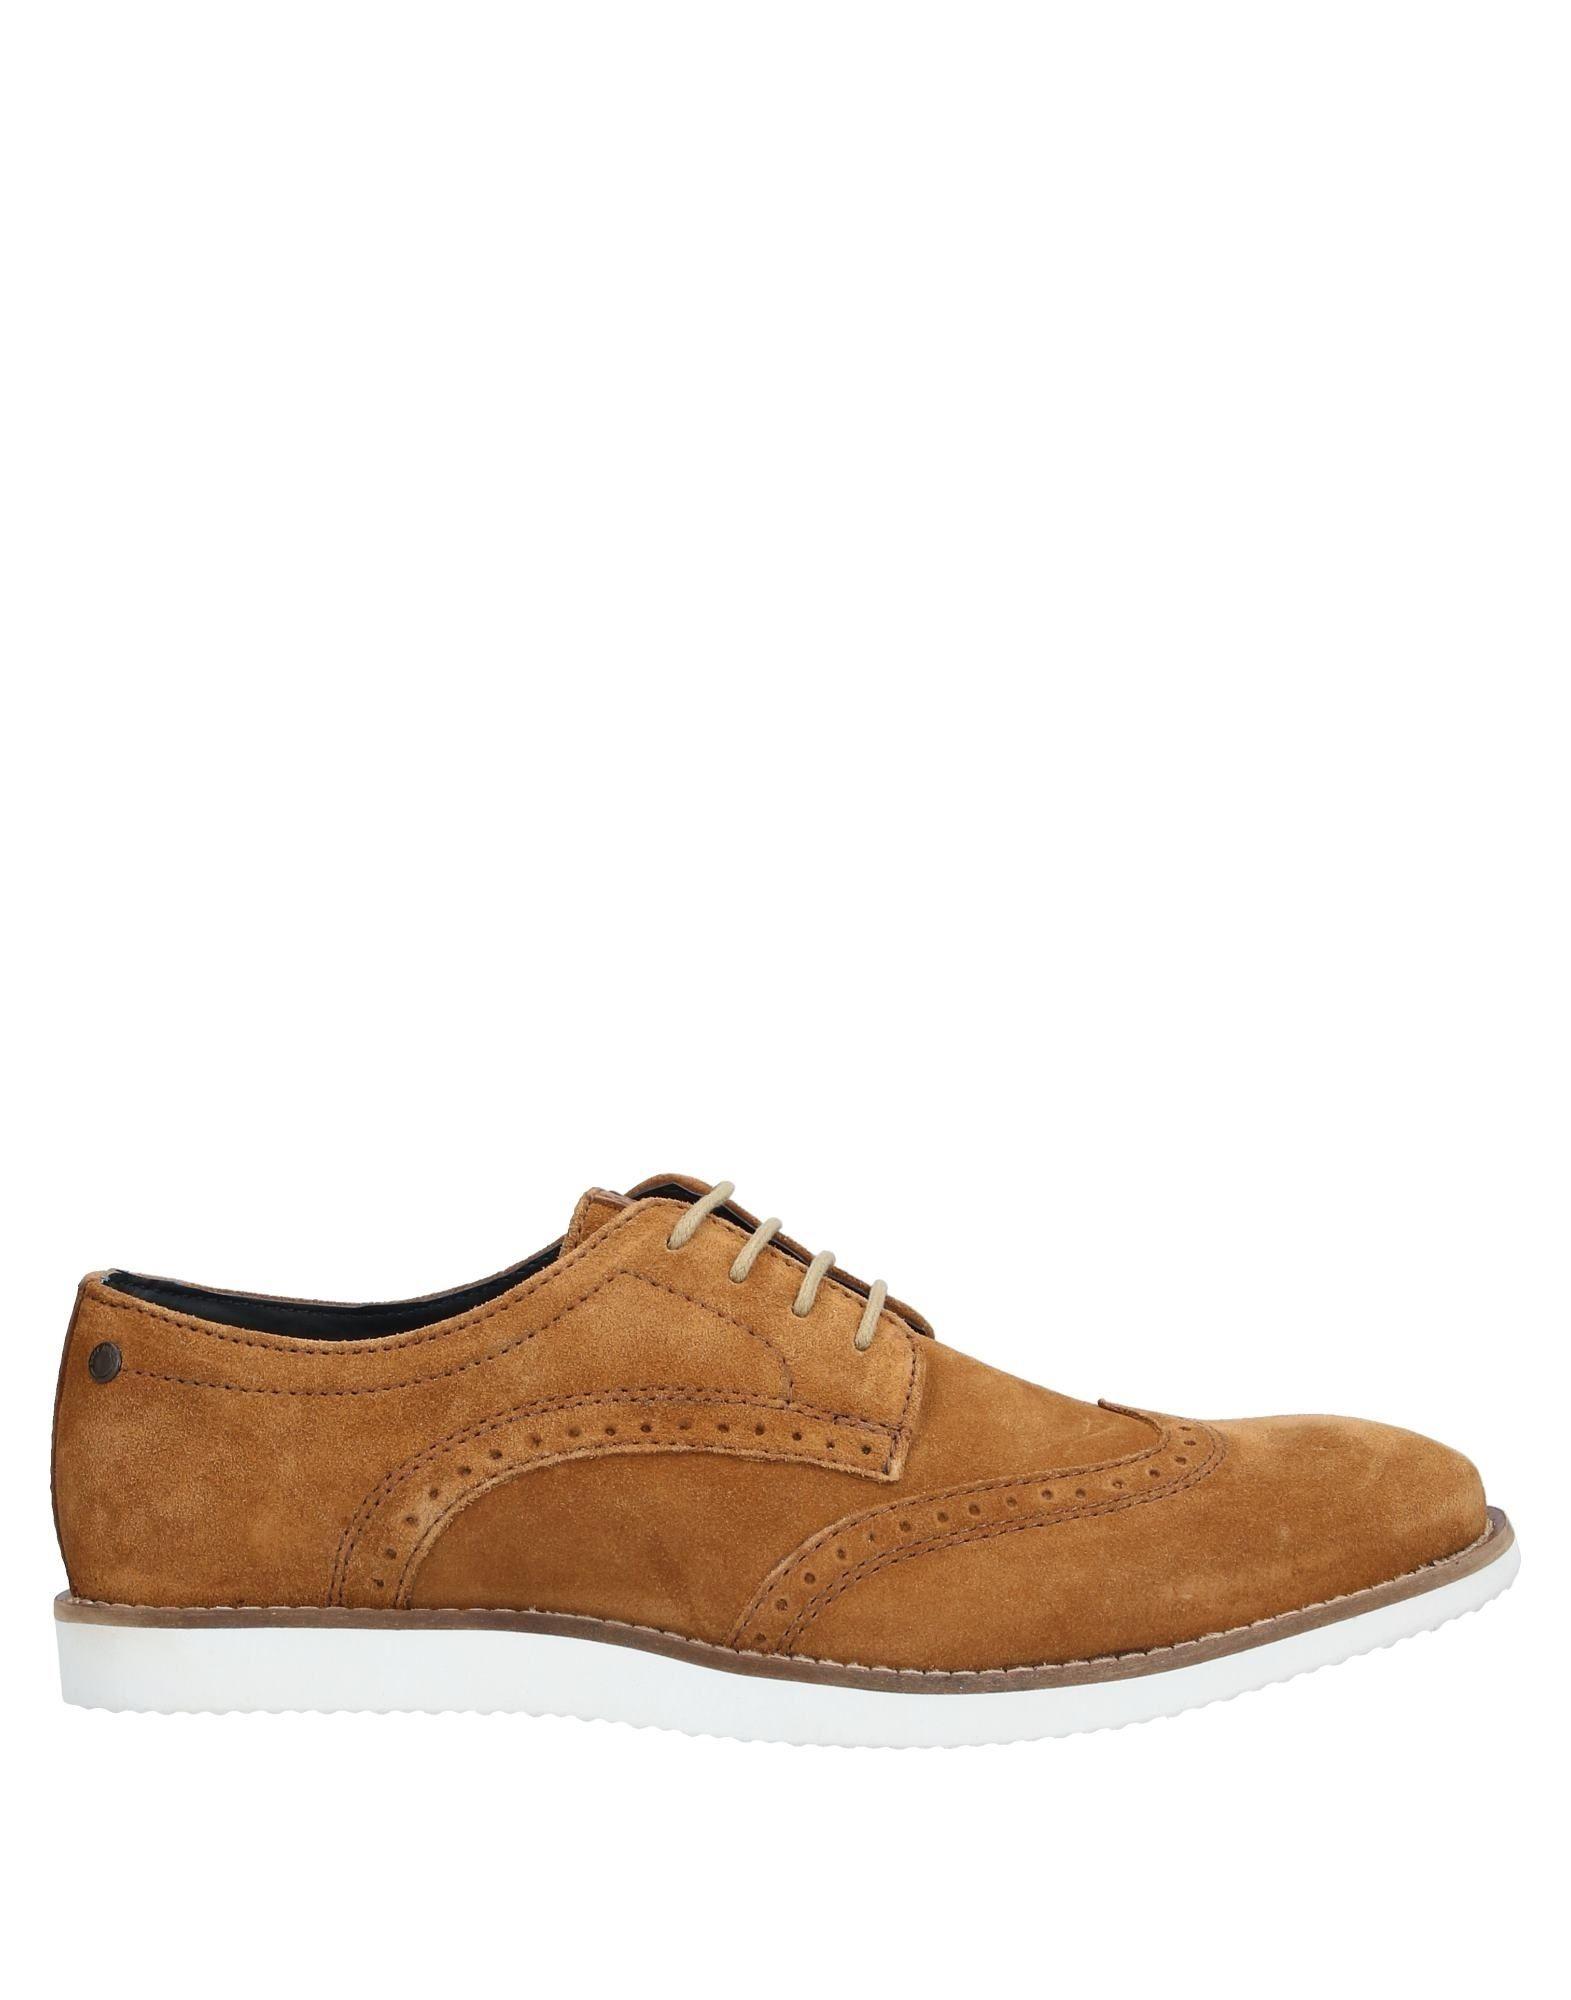 BASE London Обувь на шнурках crime london обувь на шнурках